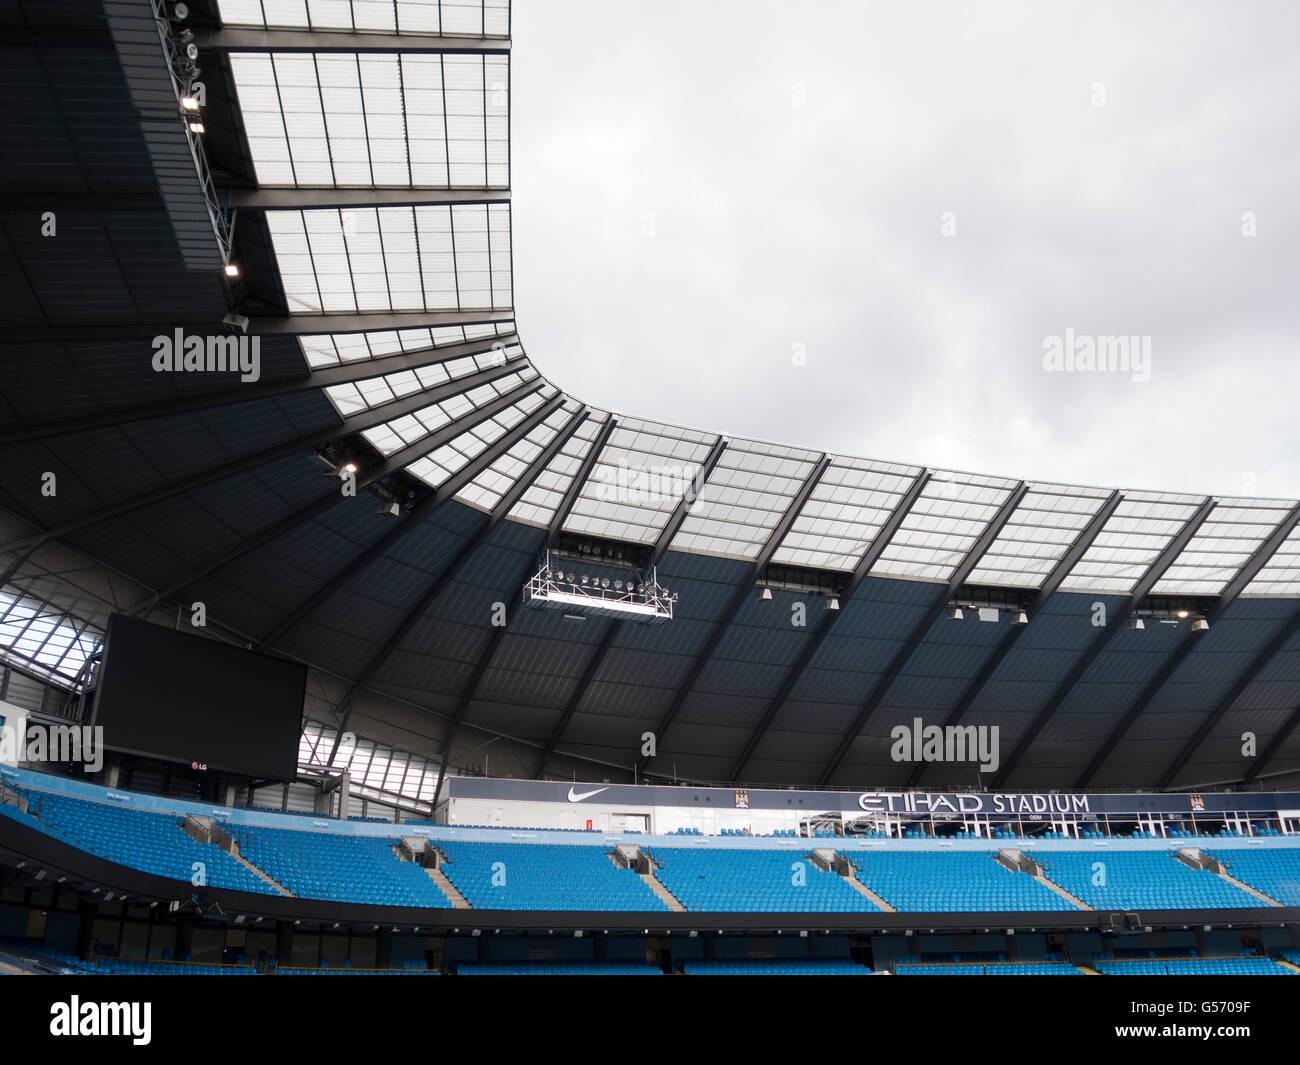 Etihad Stadium home of Manchester city football club UK - Stock Image